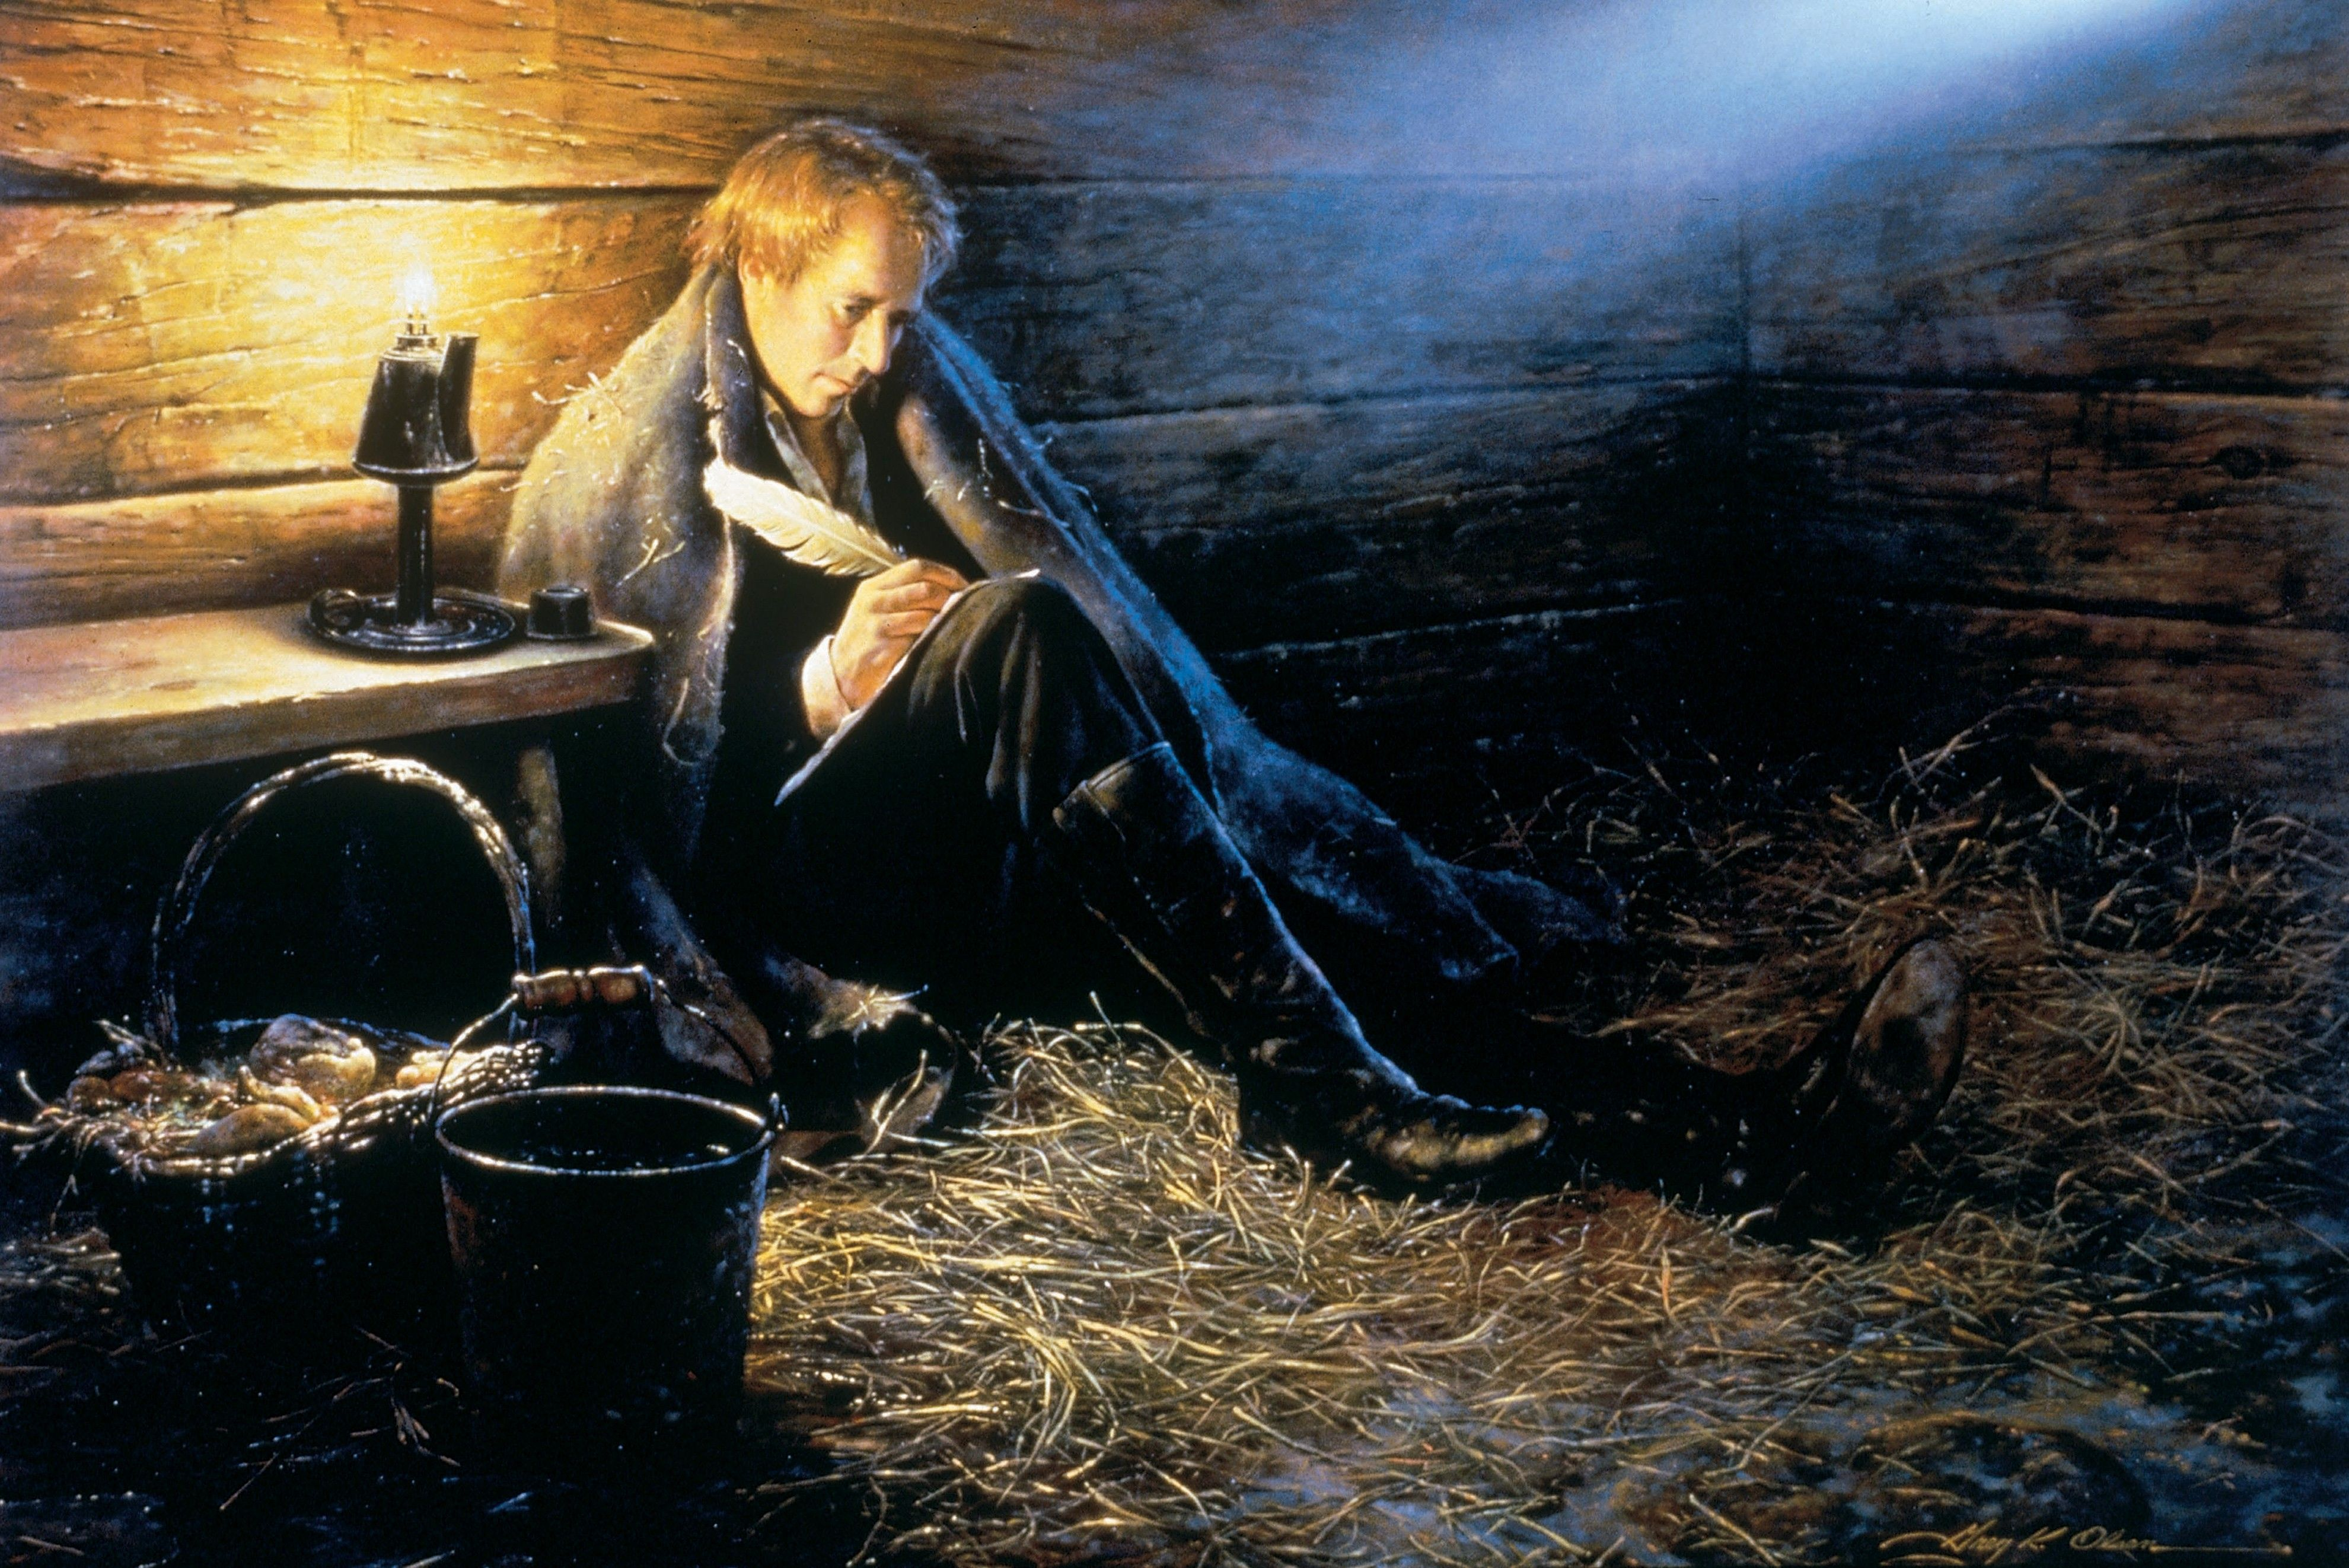 Joseph Smith in Liberty Jail, by Greg K. Olsen; Primary manual 5-32